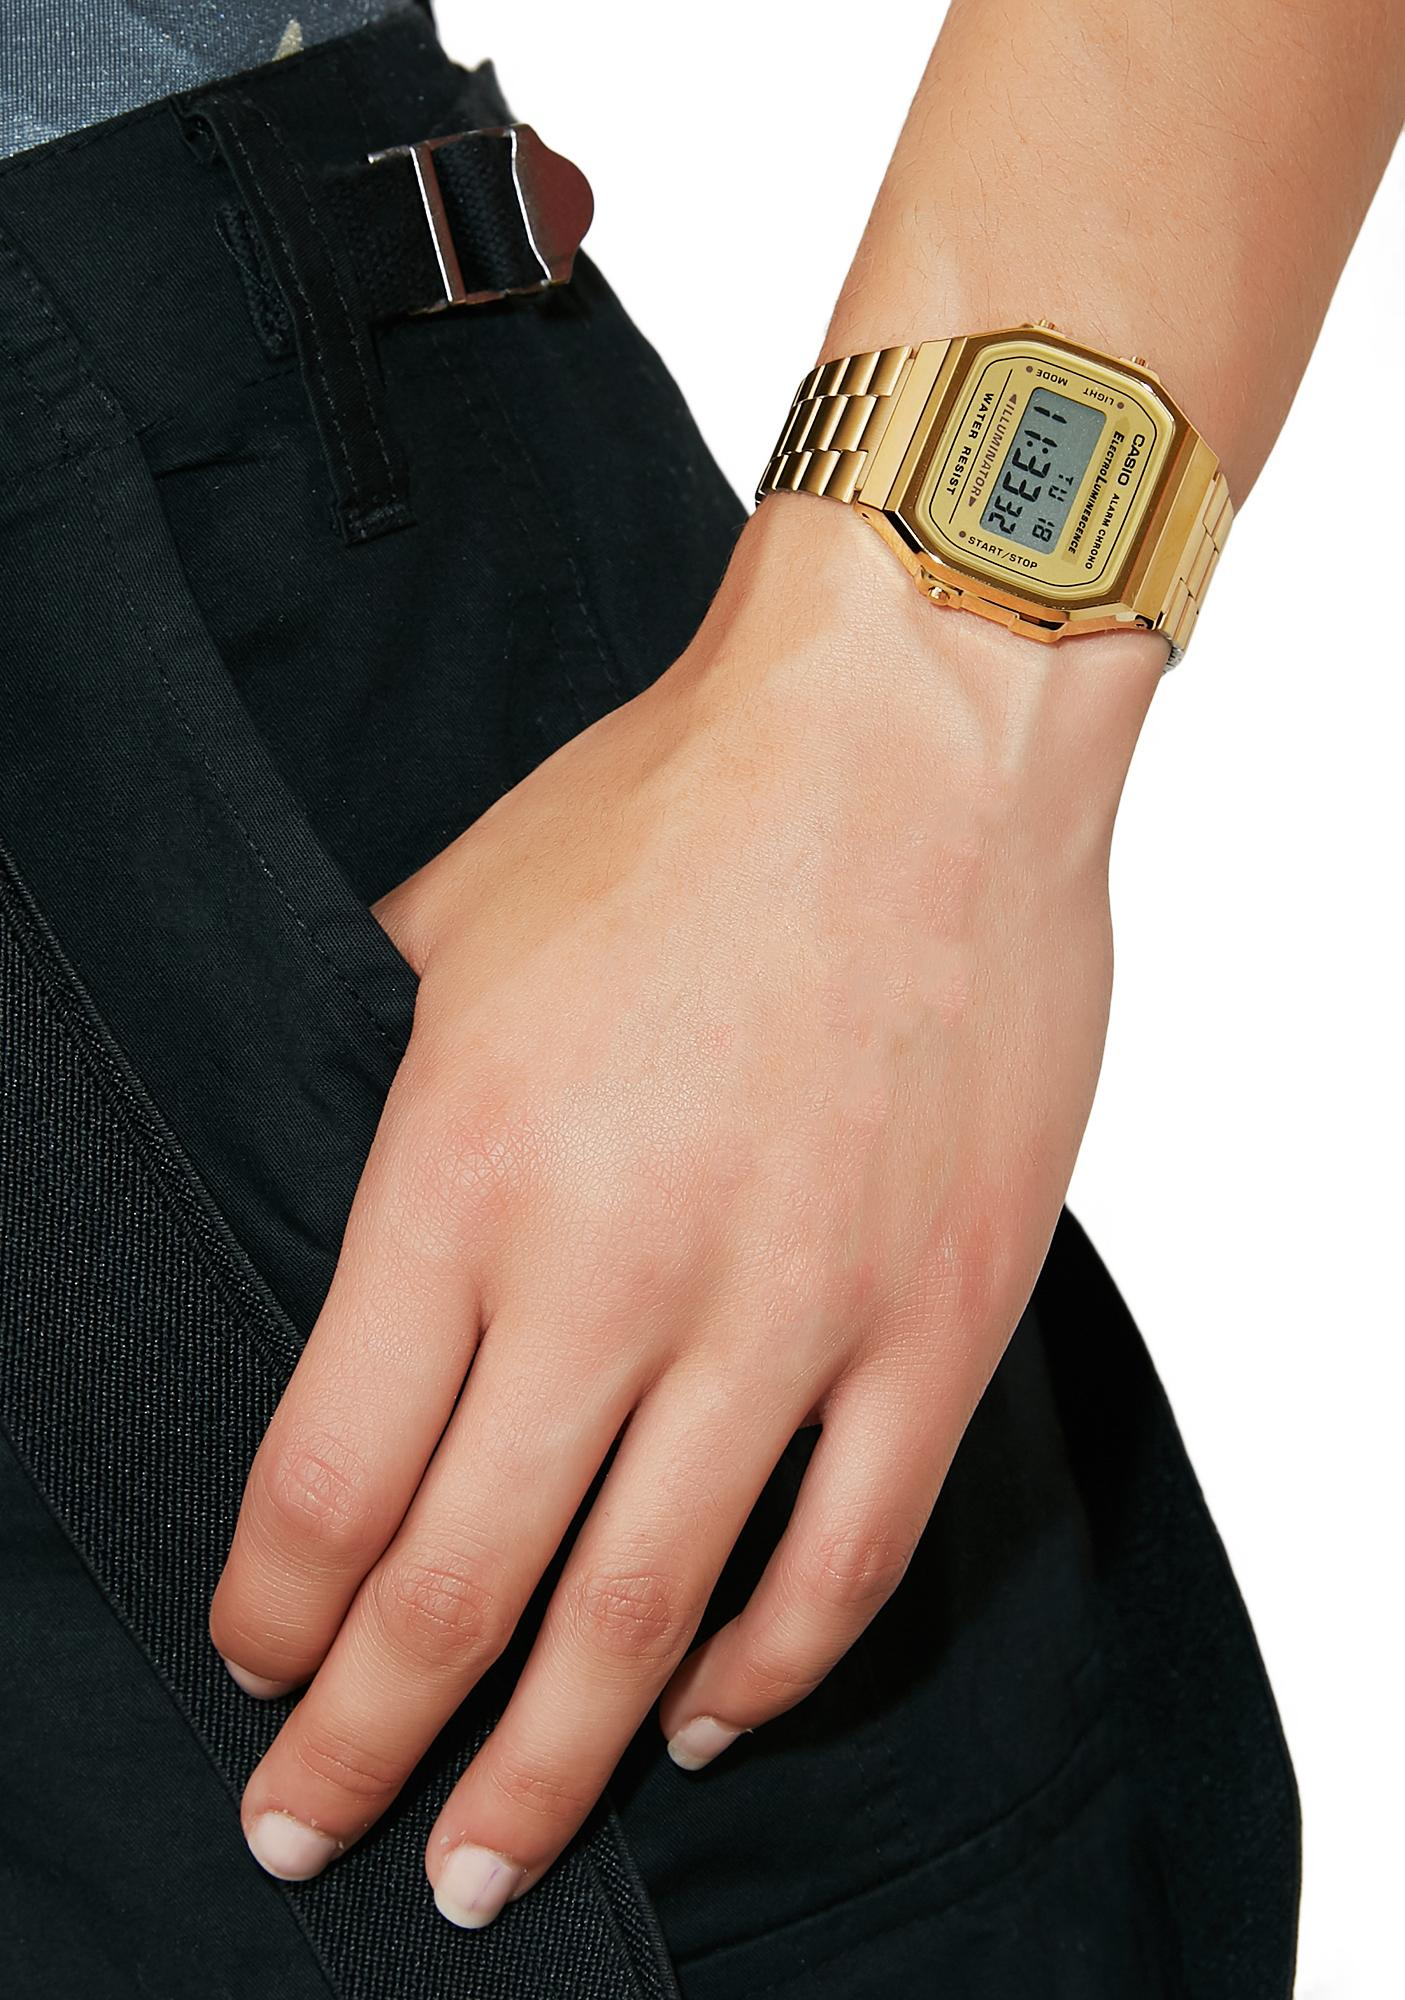 G-Shock Gambling Grandpa Vintage Casio Watch